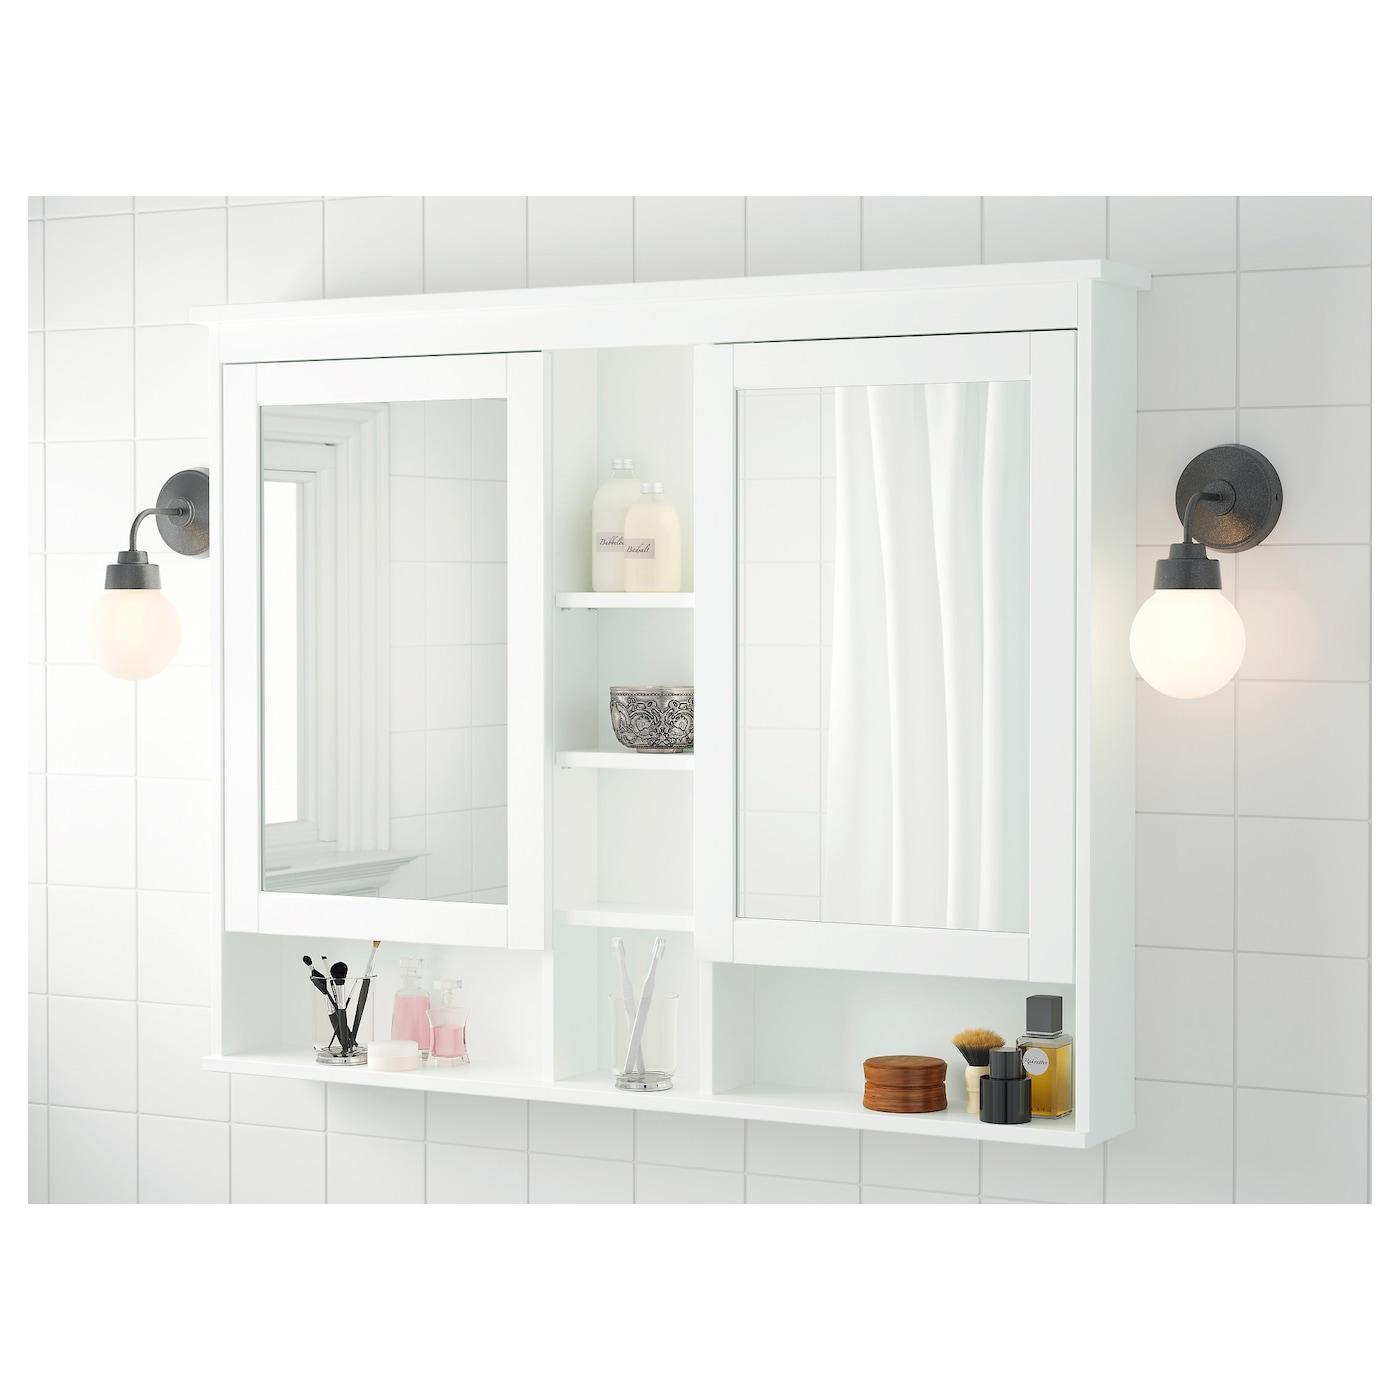 hemnes meuble miroir 2 portes blanc 120 x 98 cm ikea. Black Bedroom Furniture Sets. Home Design Ideas